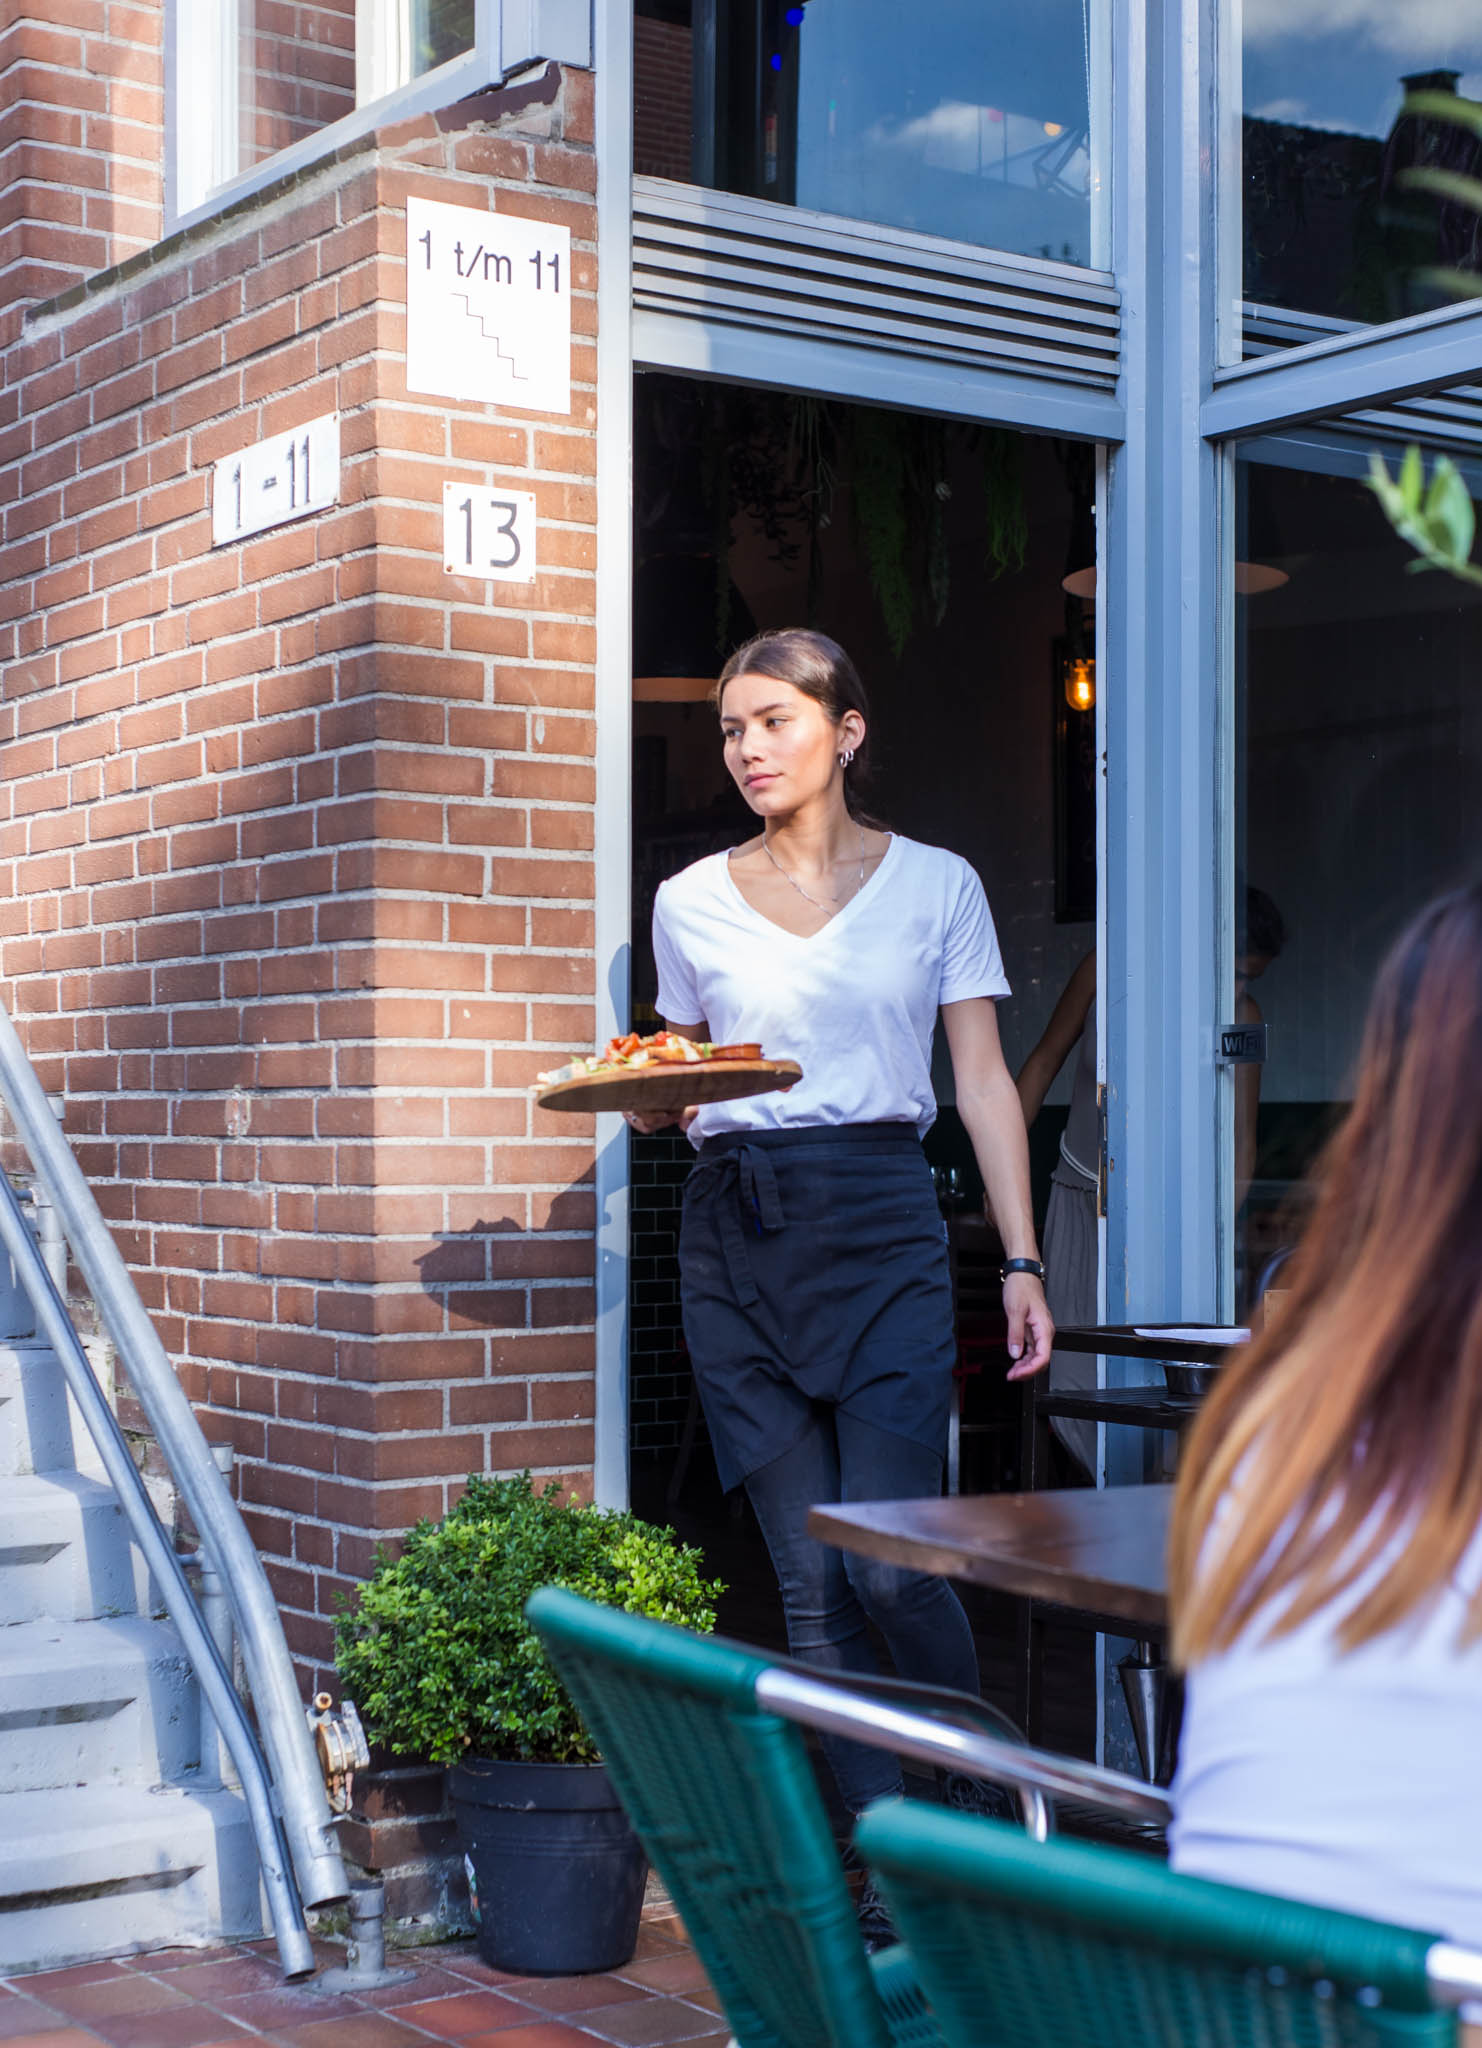 Waitress going outside a restaurant